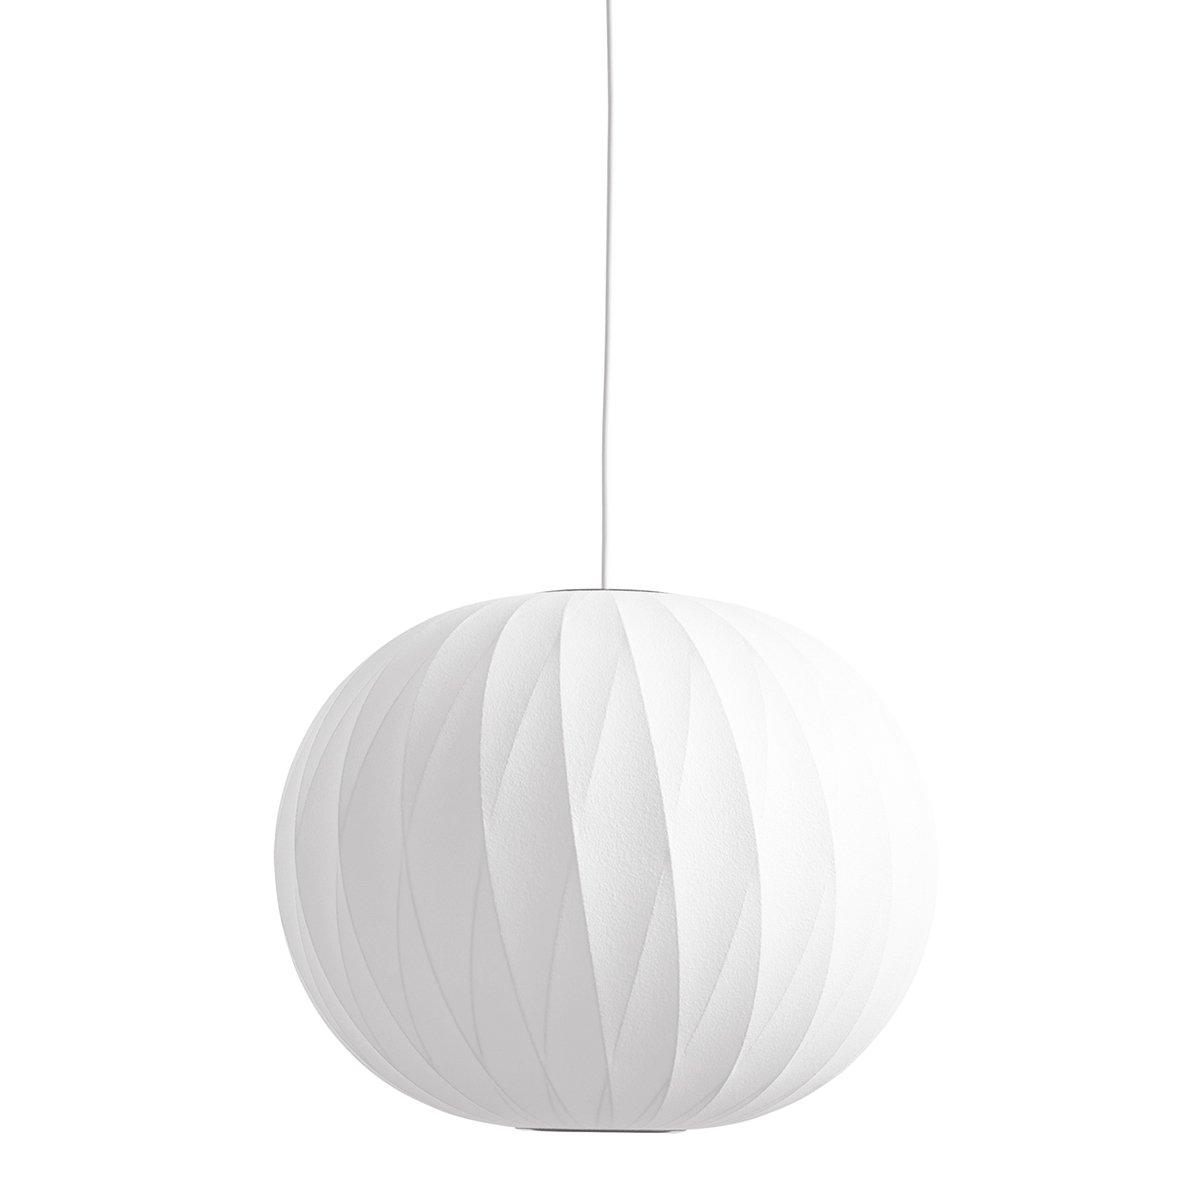 HAY Nelson Ball Crisscross Bubble Hanglamp - S: � 32,5 x h. 30,5 cm.